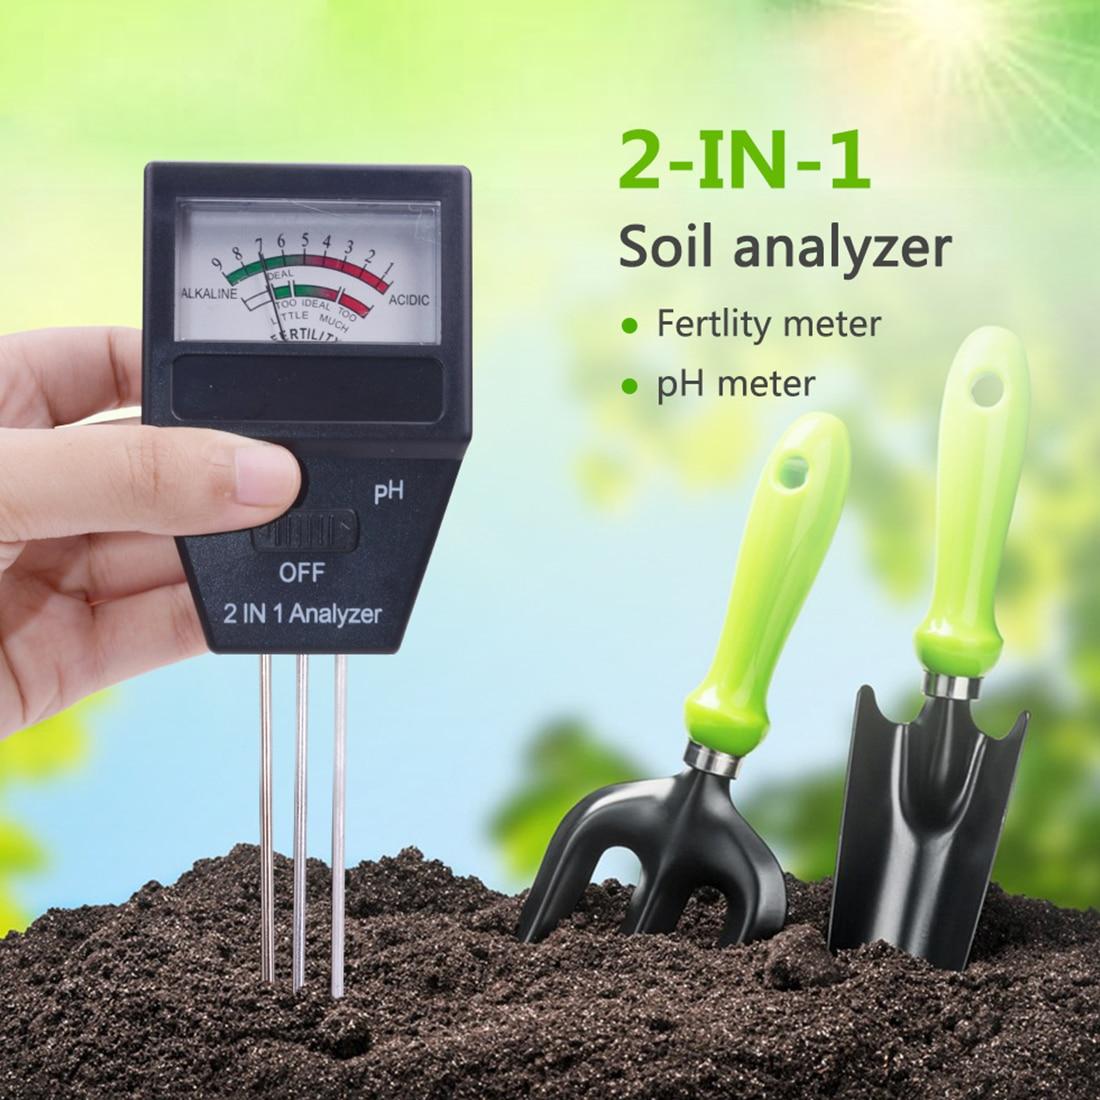 New Brand Gardening Tools 2 In 1 Soil PH Meter & Fertility Tester Soil Fertility Meter Acidity Meter Instrument For Gardening